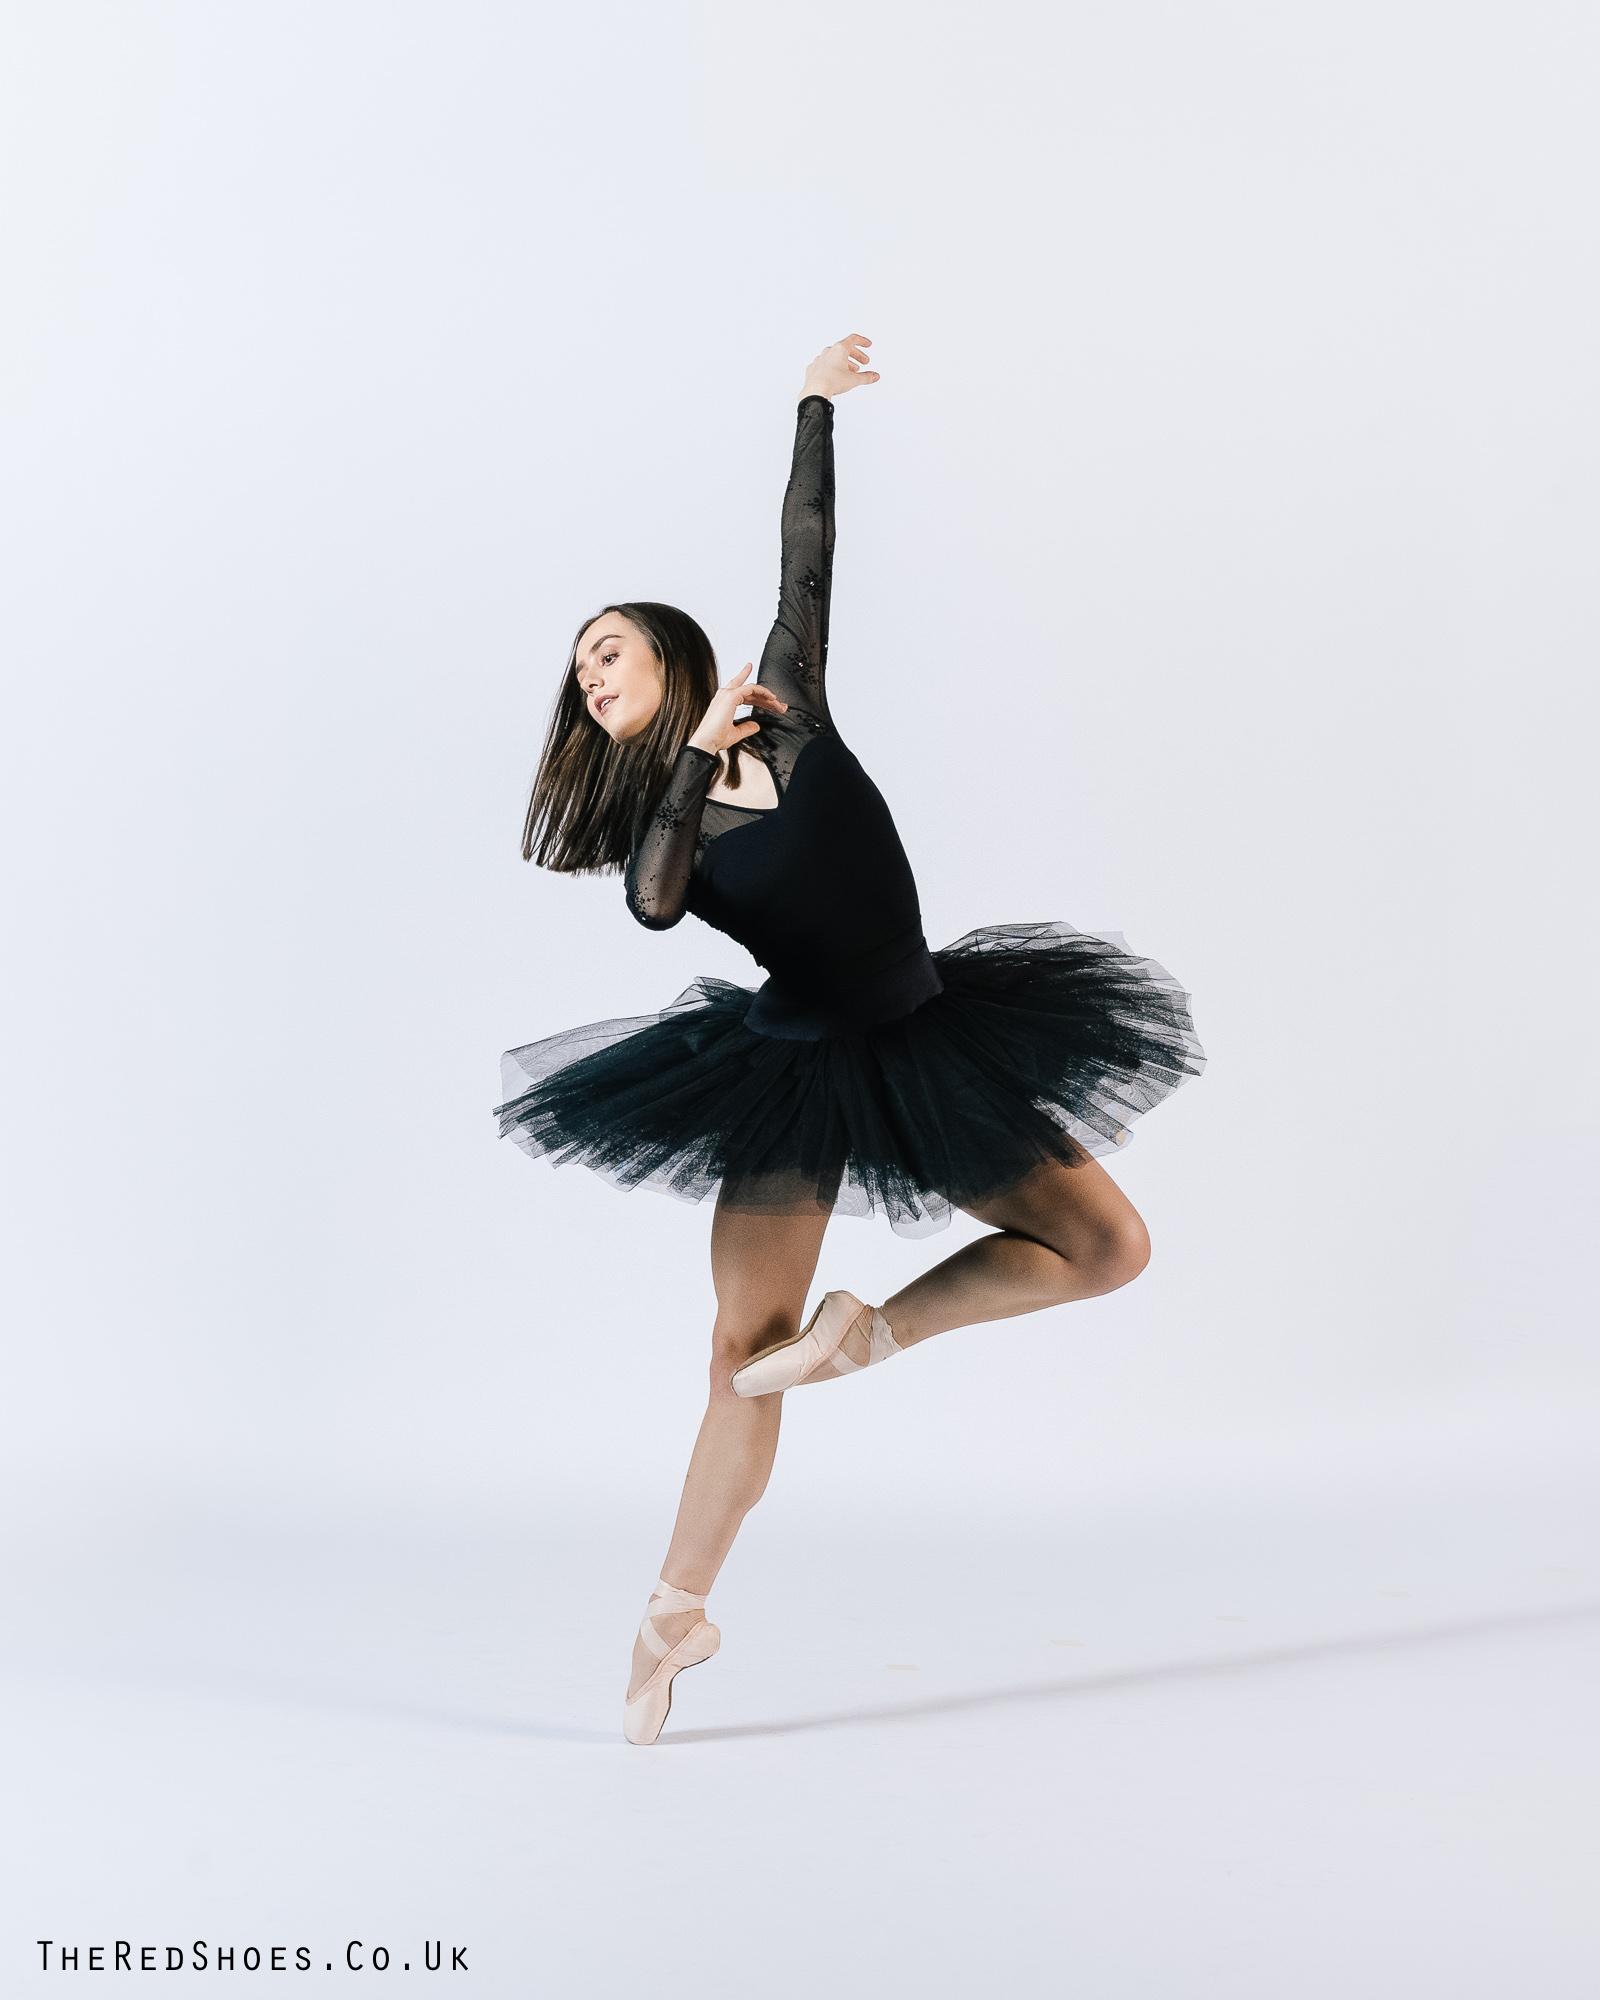 dance-photography-7.jpg